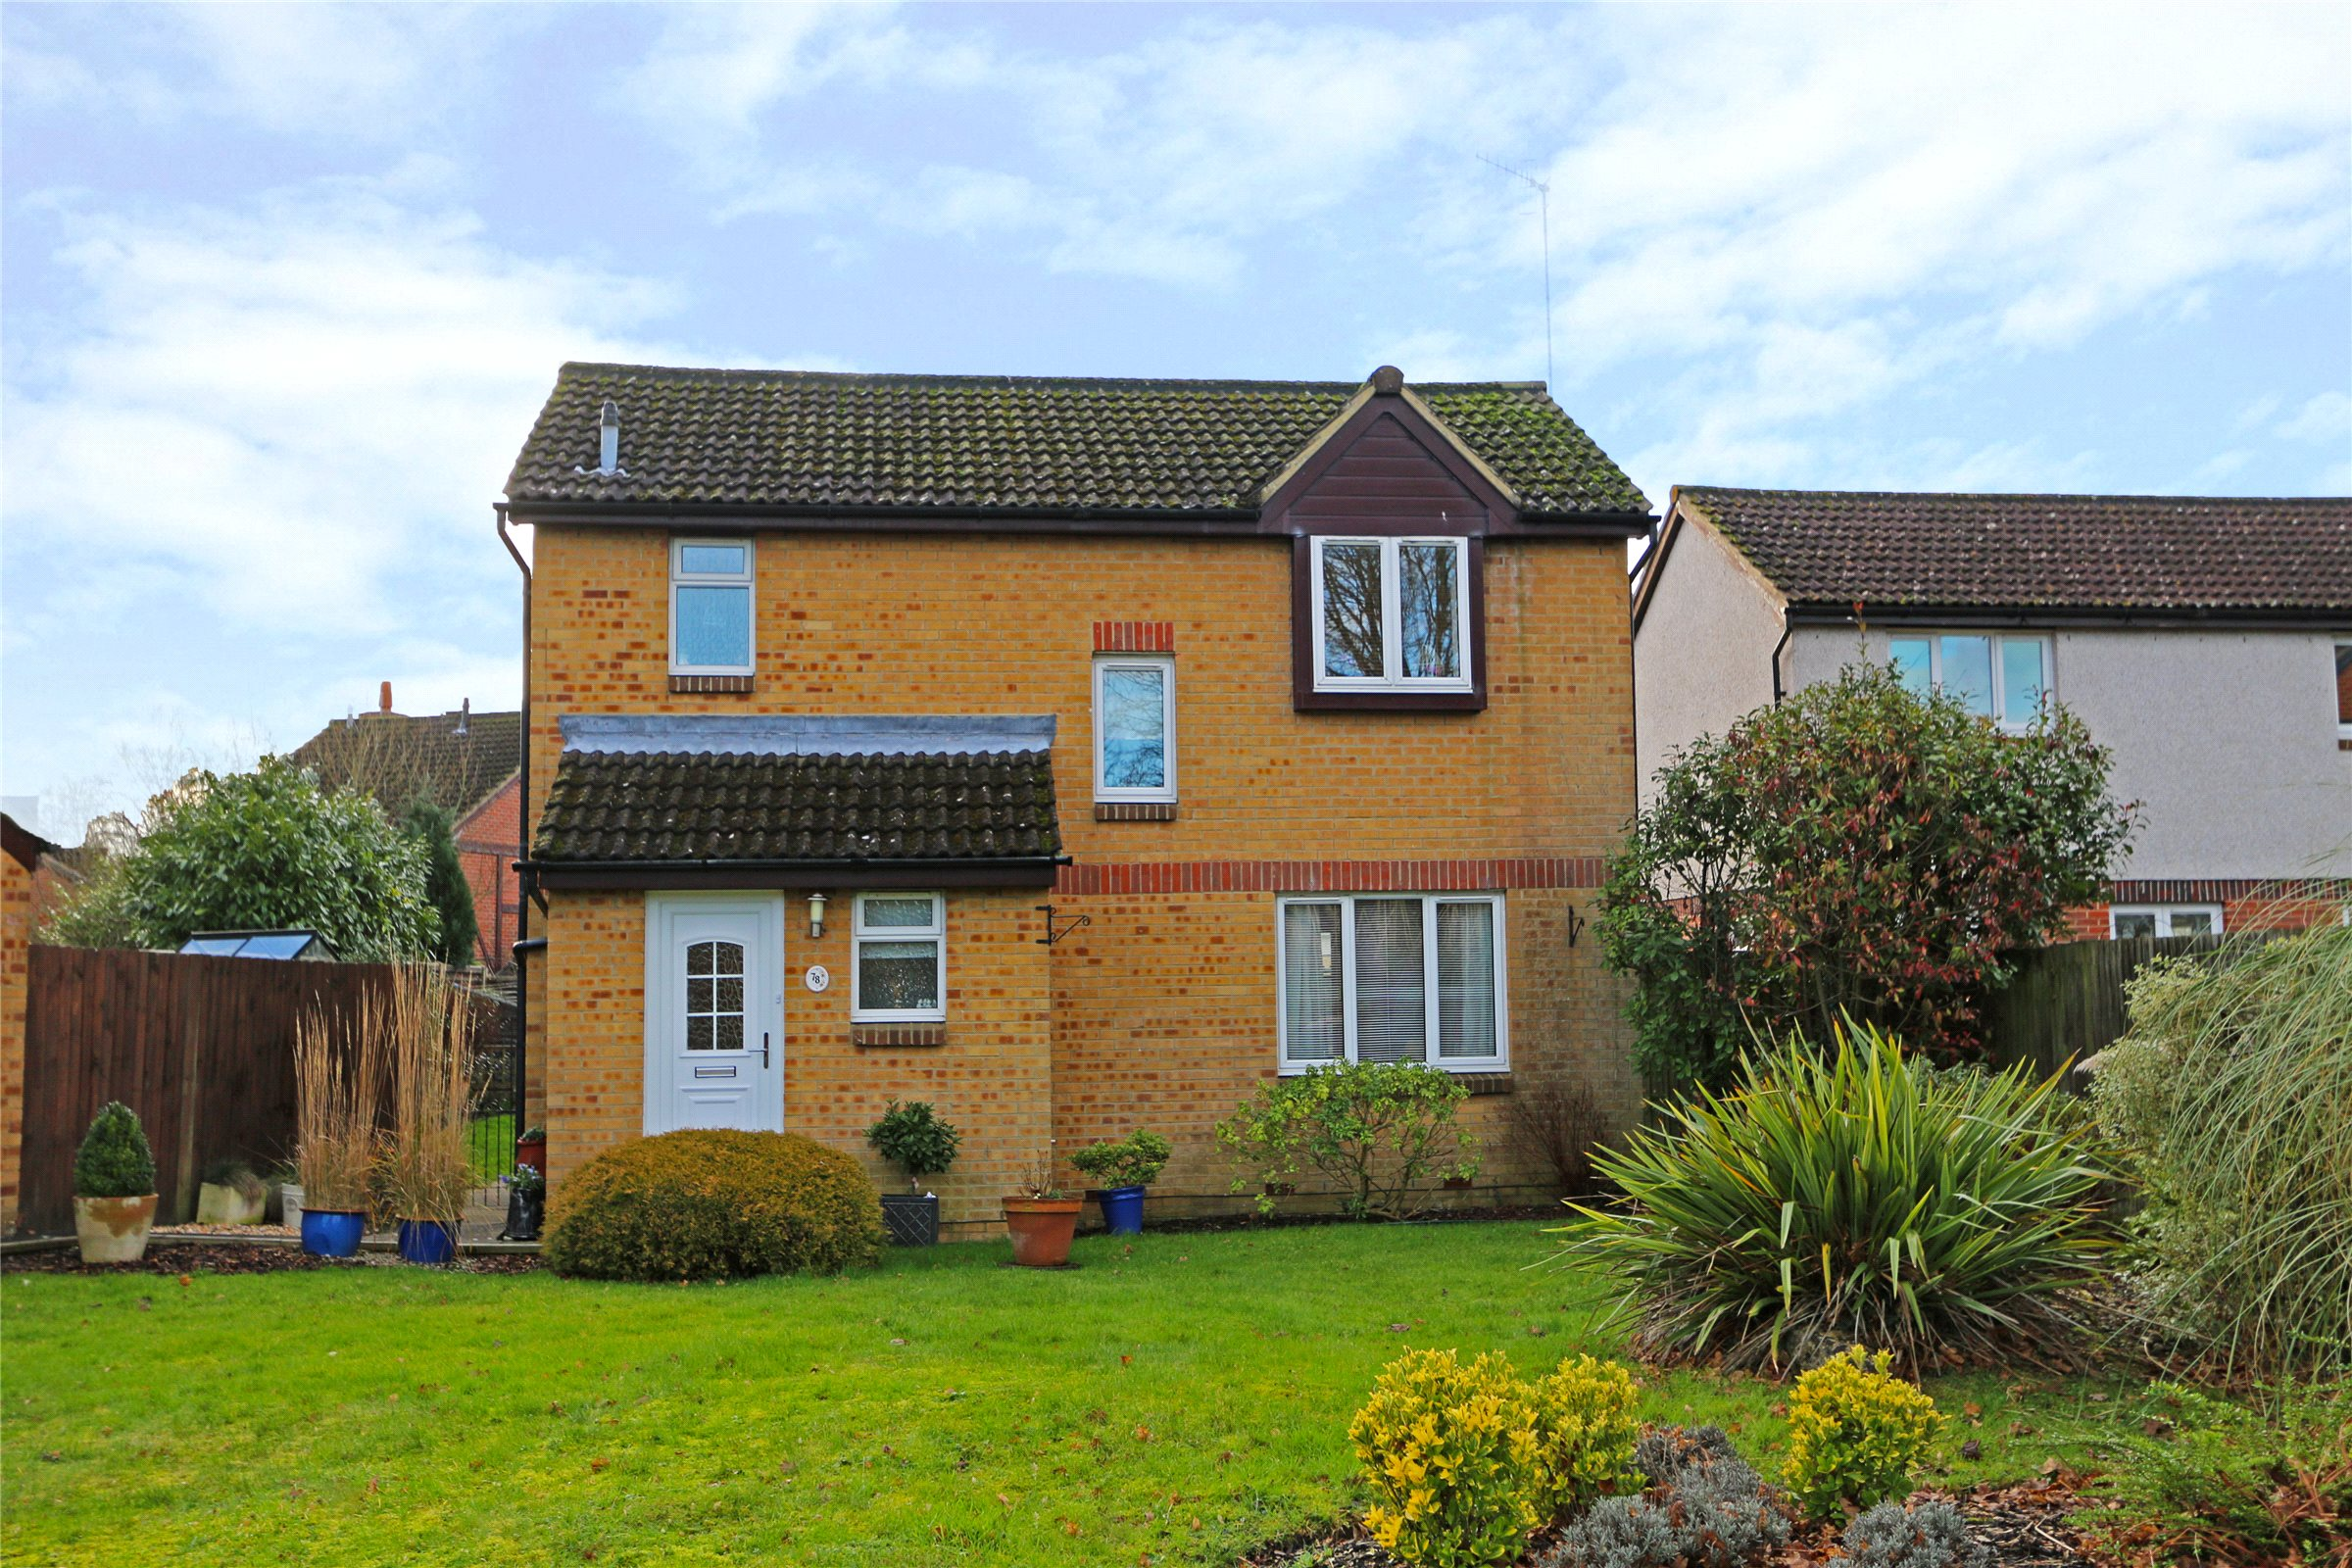 3 Bedrooms Detached House for sale in Holmesdale Road, North Holmwood, Dorking, Surrey, RH5